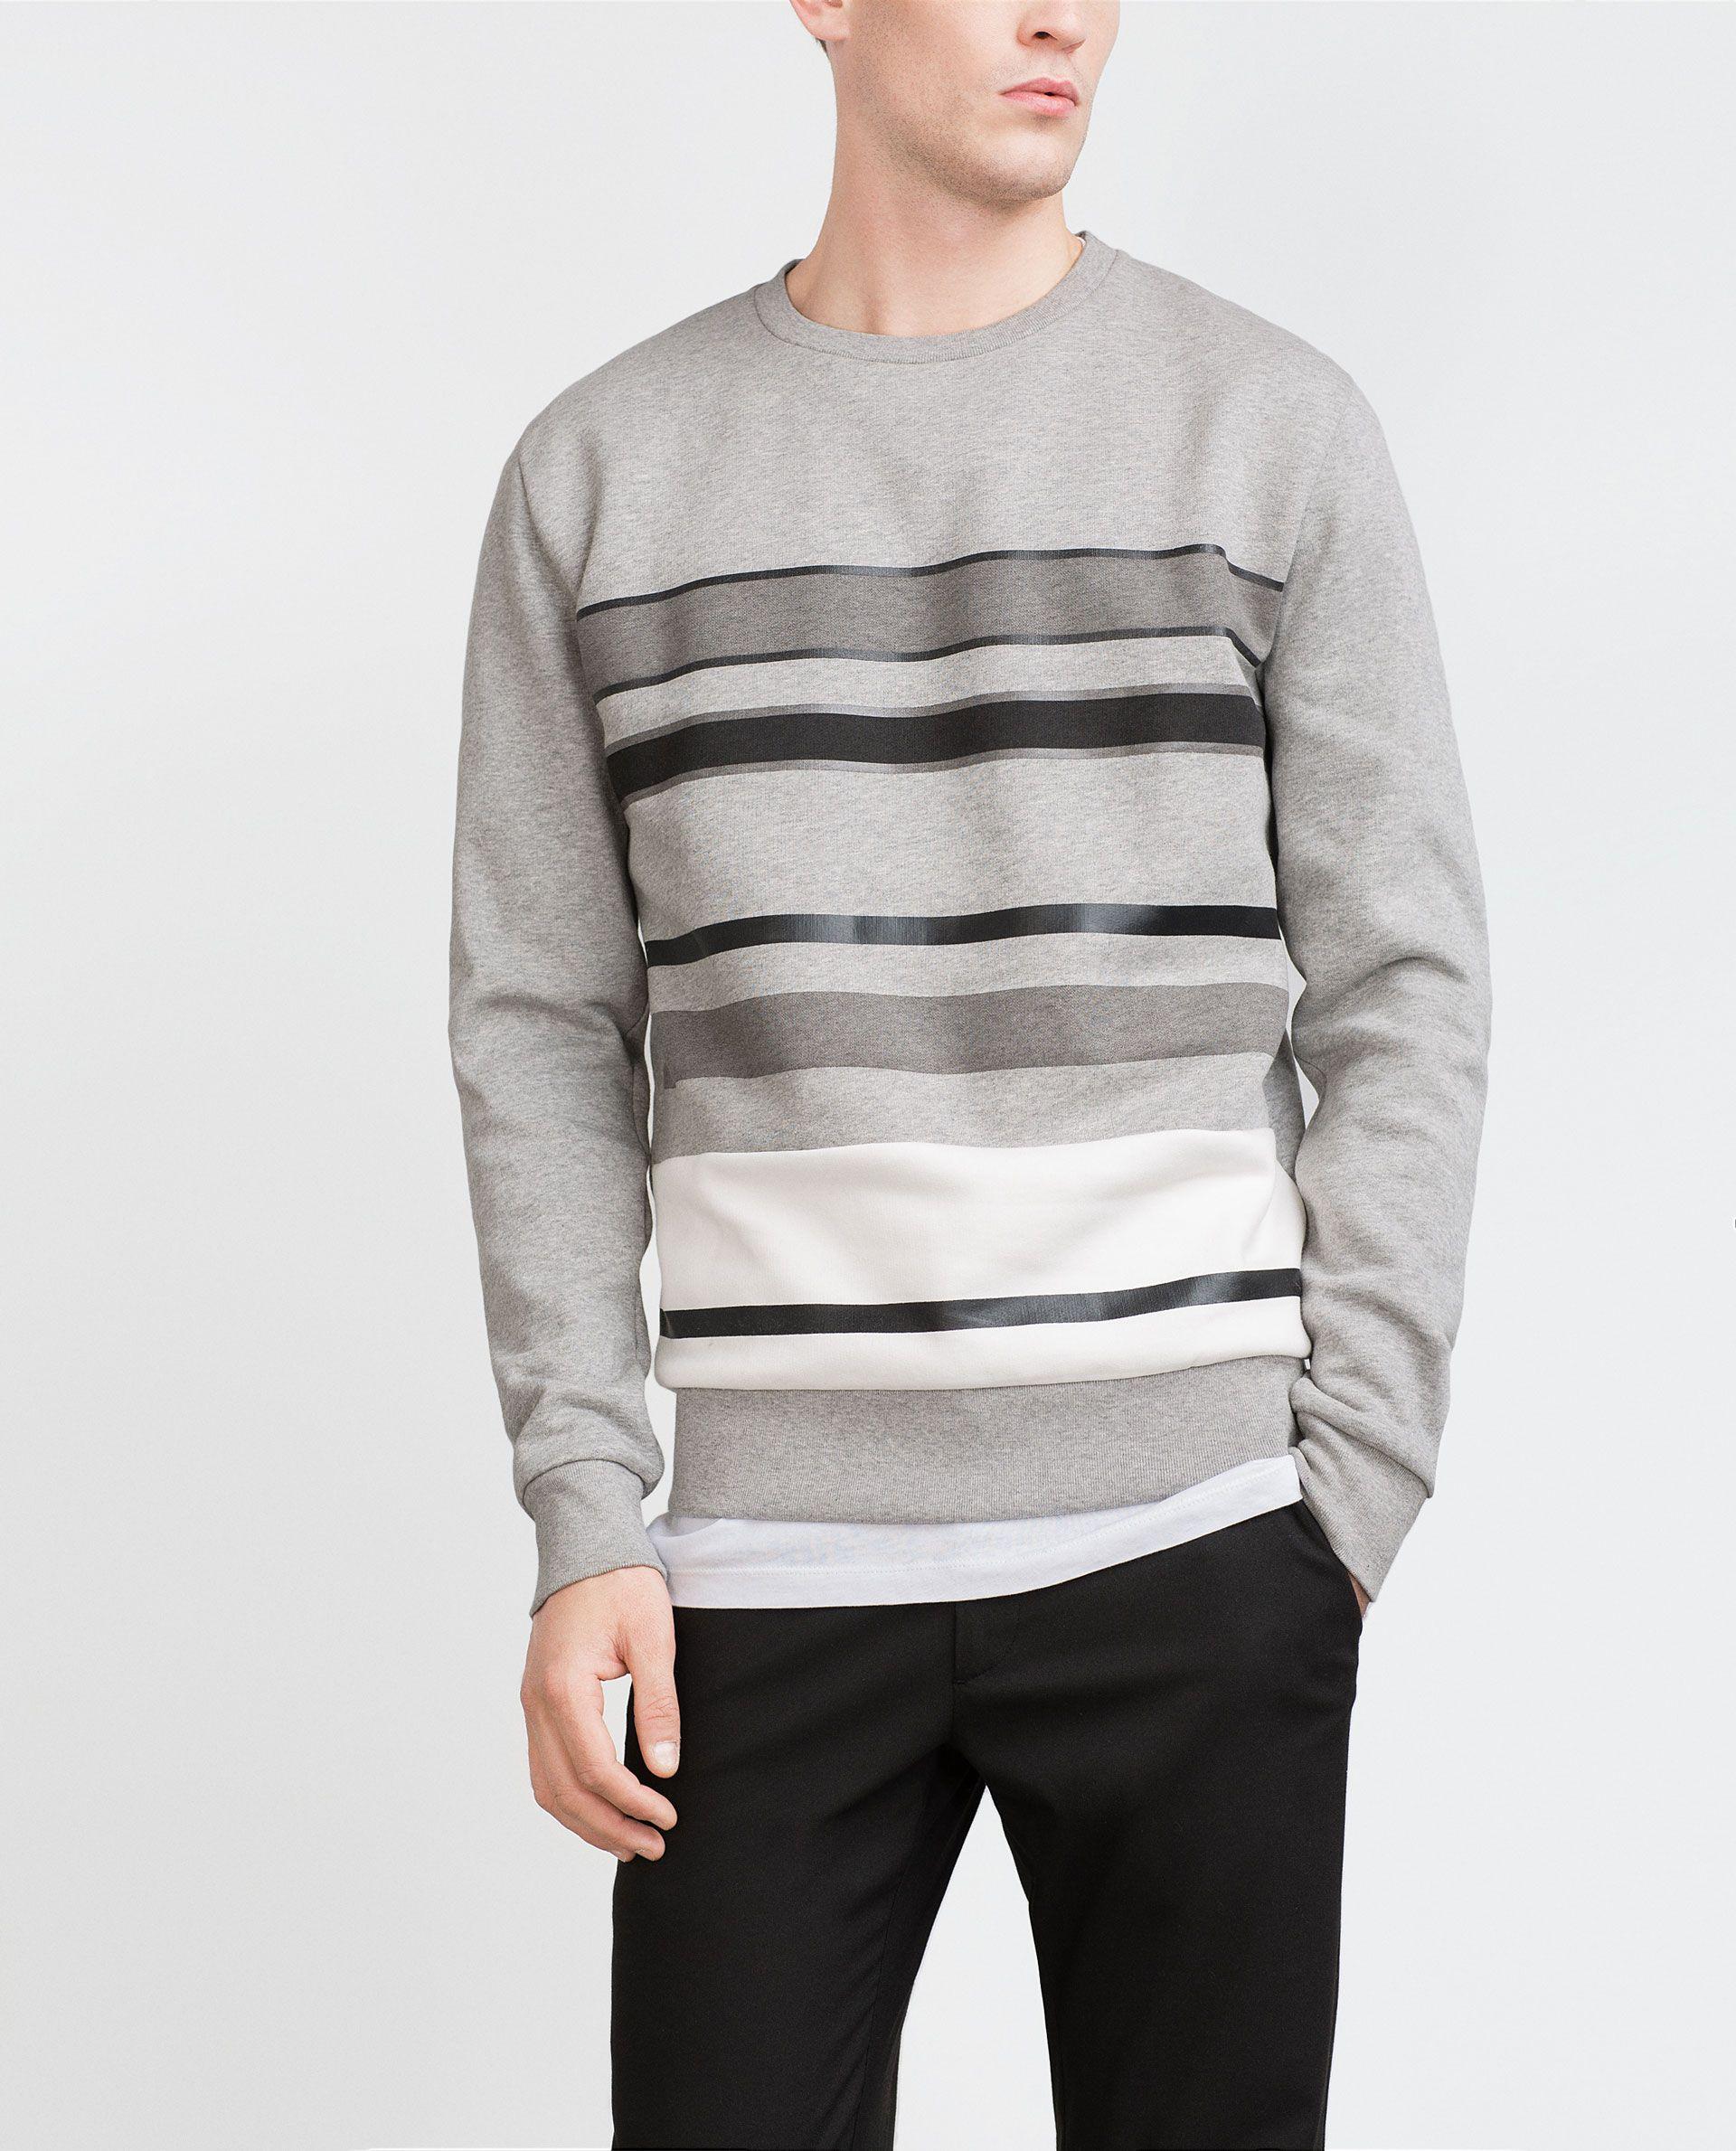 Adidas Id Stadium Crewneck Sweatshirt Solid Grey Raw White Crew Neck Sweatshirt Sweatshirts Athletic Fashion [ 2400 x 1800 Pixel ]